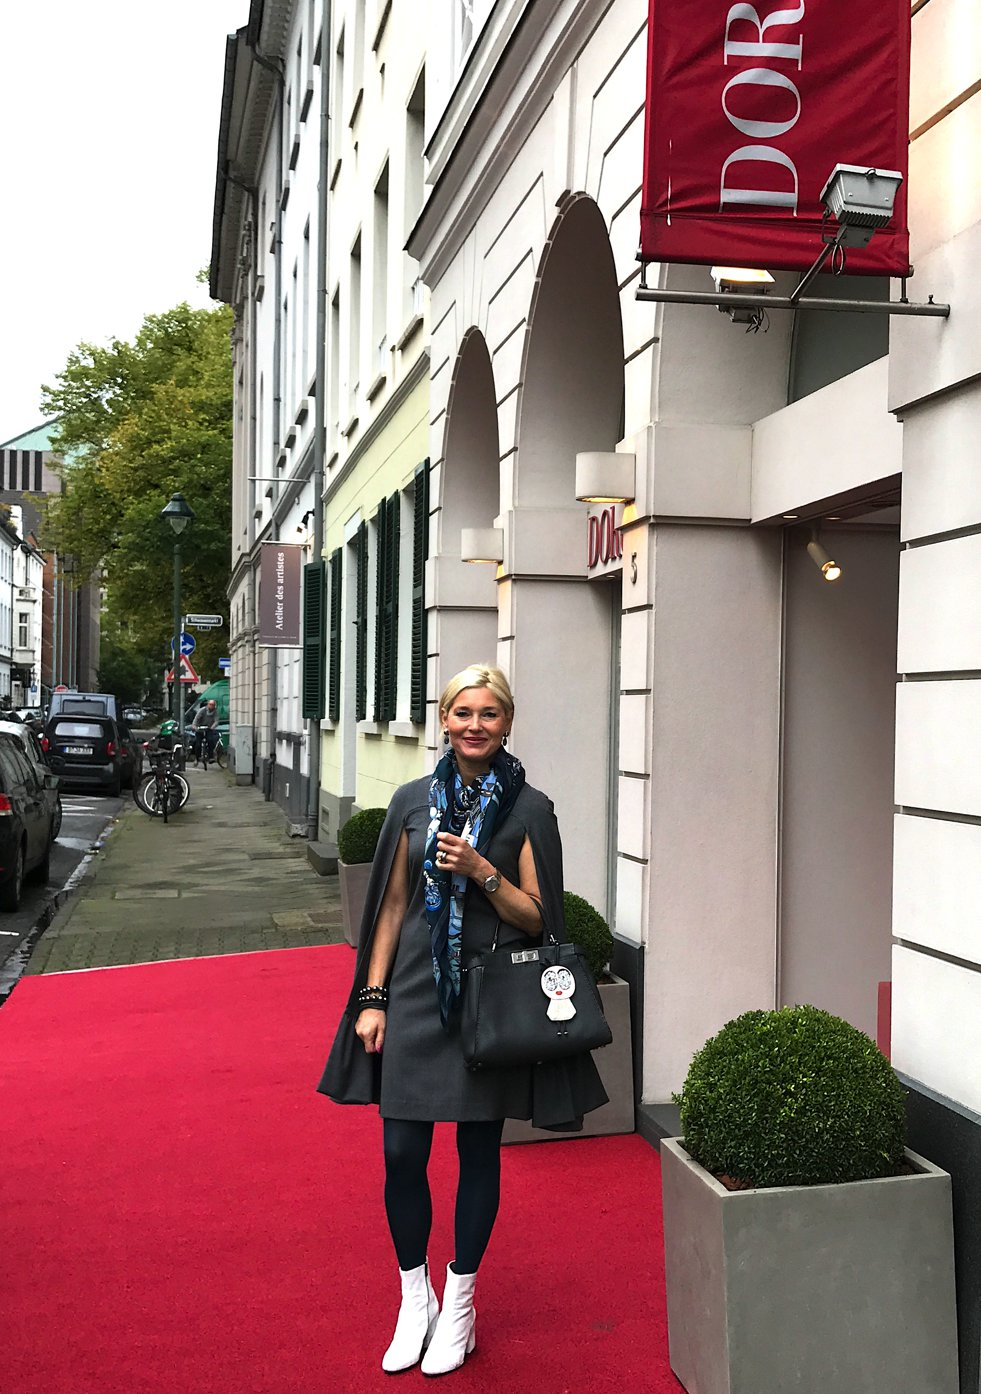 Petra Dieners, Dorotheum Düsseldorf, Georg Hornemann Objets d´Art, Lifestyle-Blog, Lieblingsstil.com,